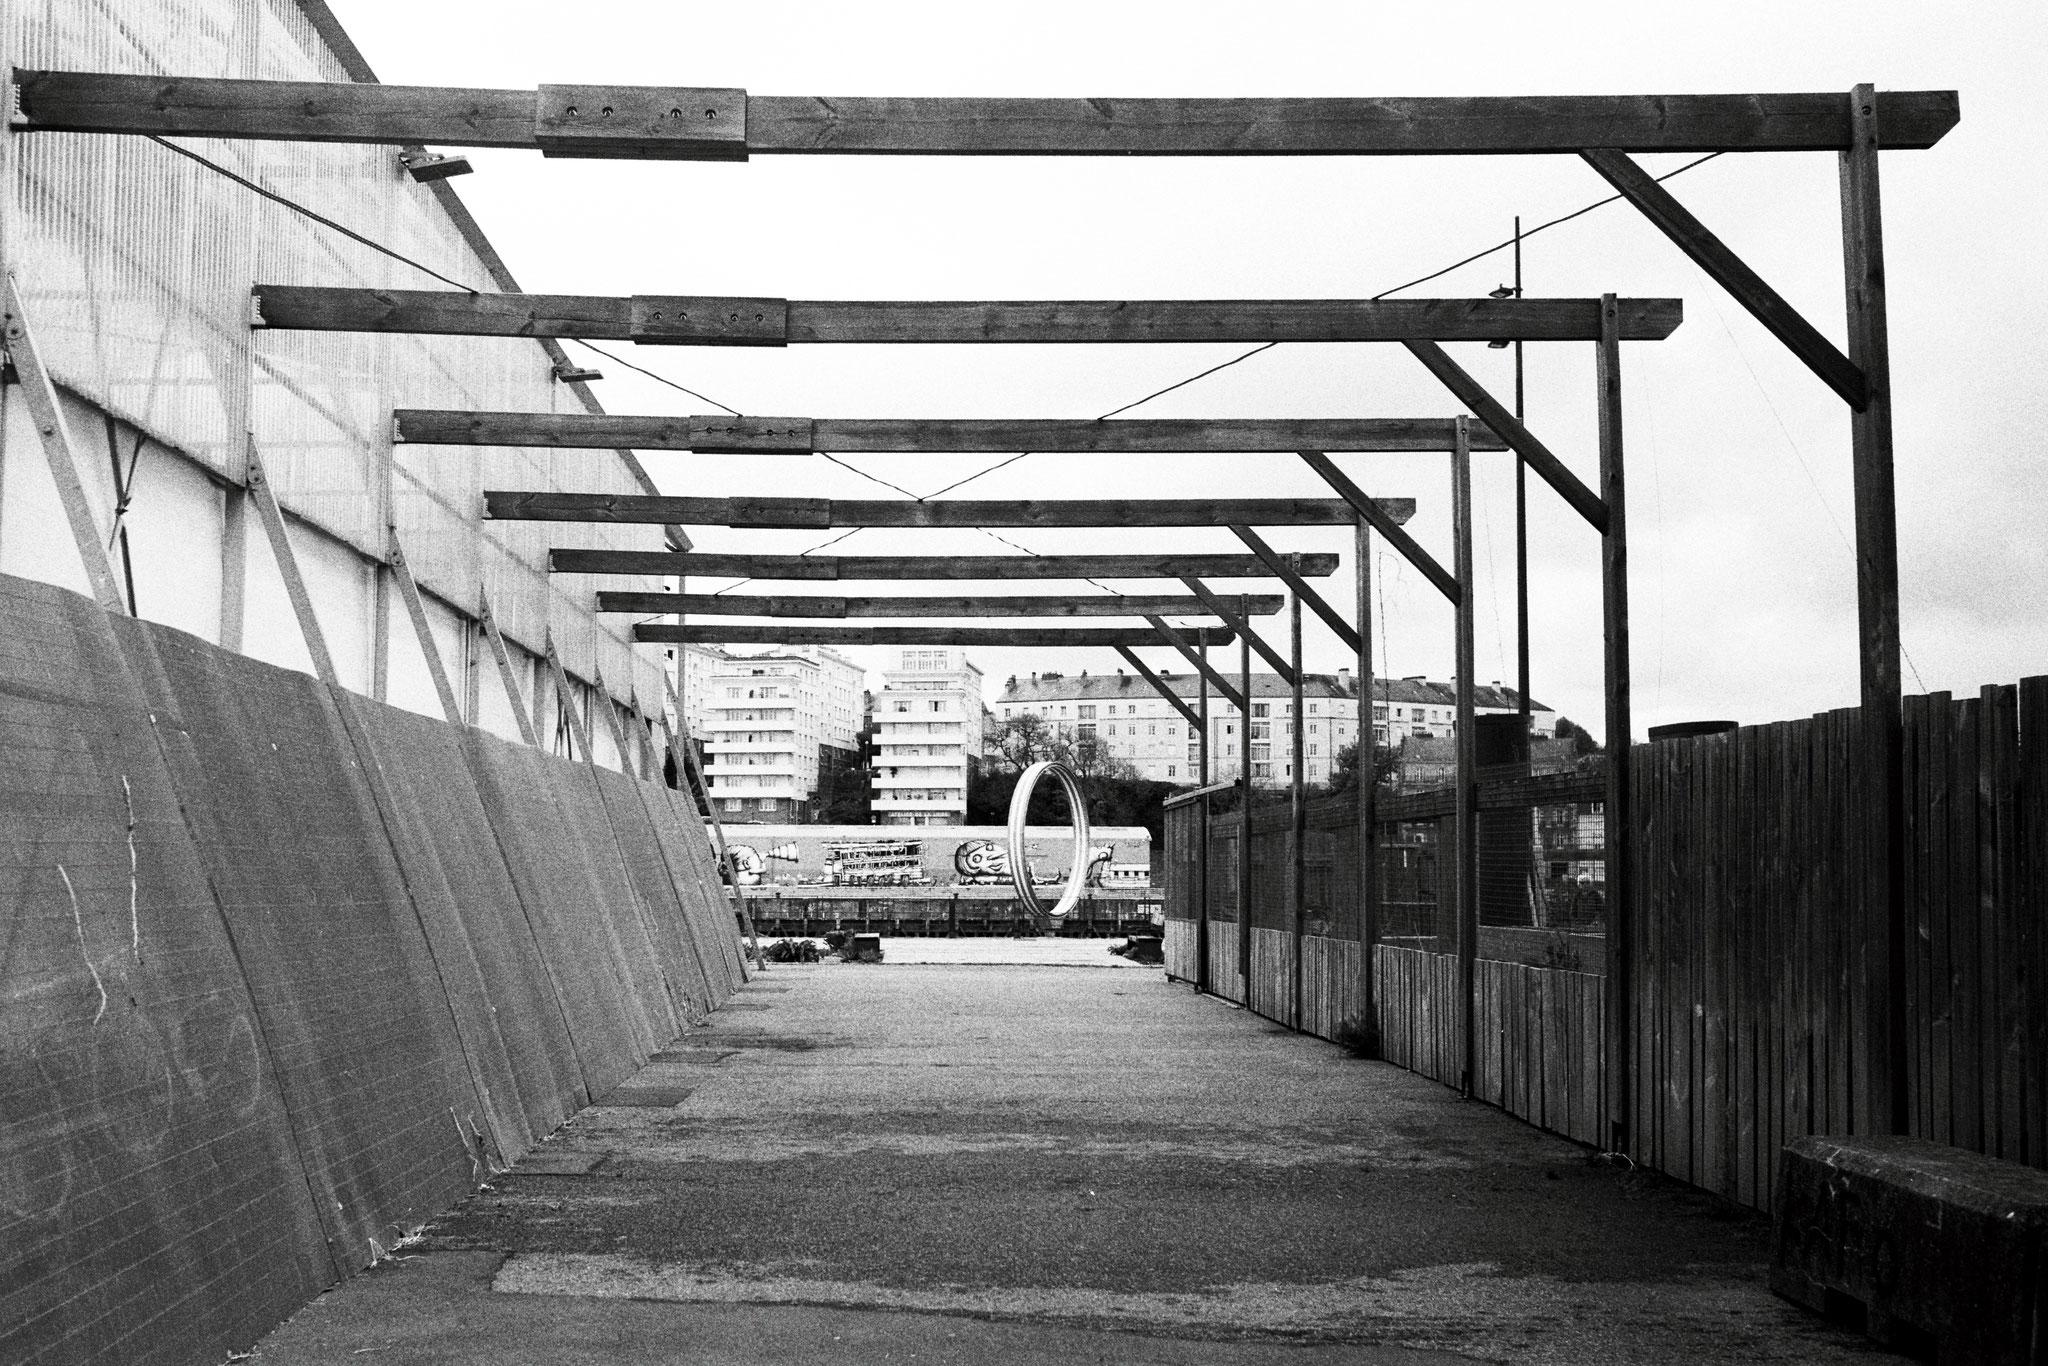 """Wood vs concrete"" - Quai des Antilles, Nantes (2021). Street Candy MKN 100 ASA. © Clémence Rougetet"